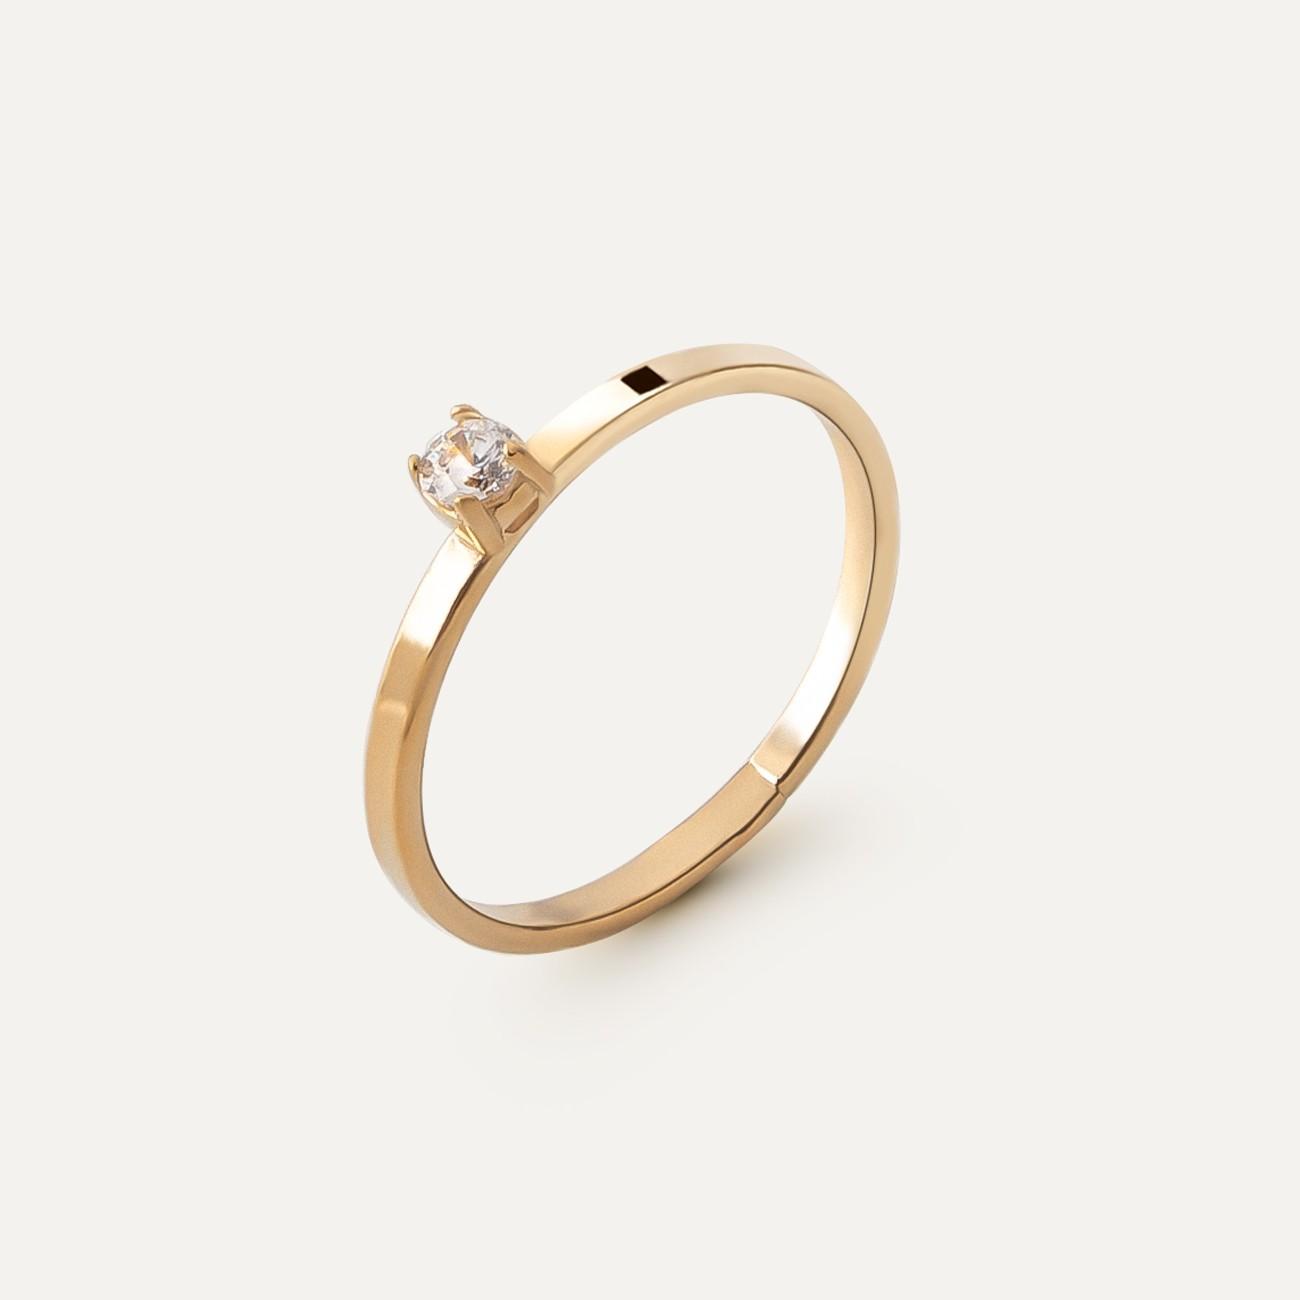 Srebrny pierścionek z cyrkonią 3mm My RING™ 925